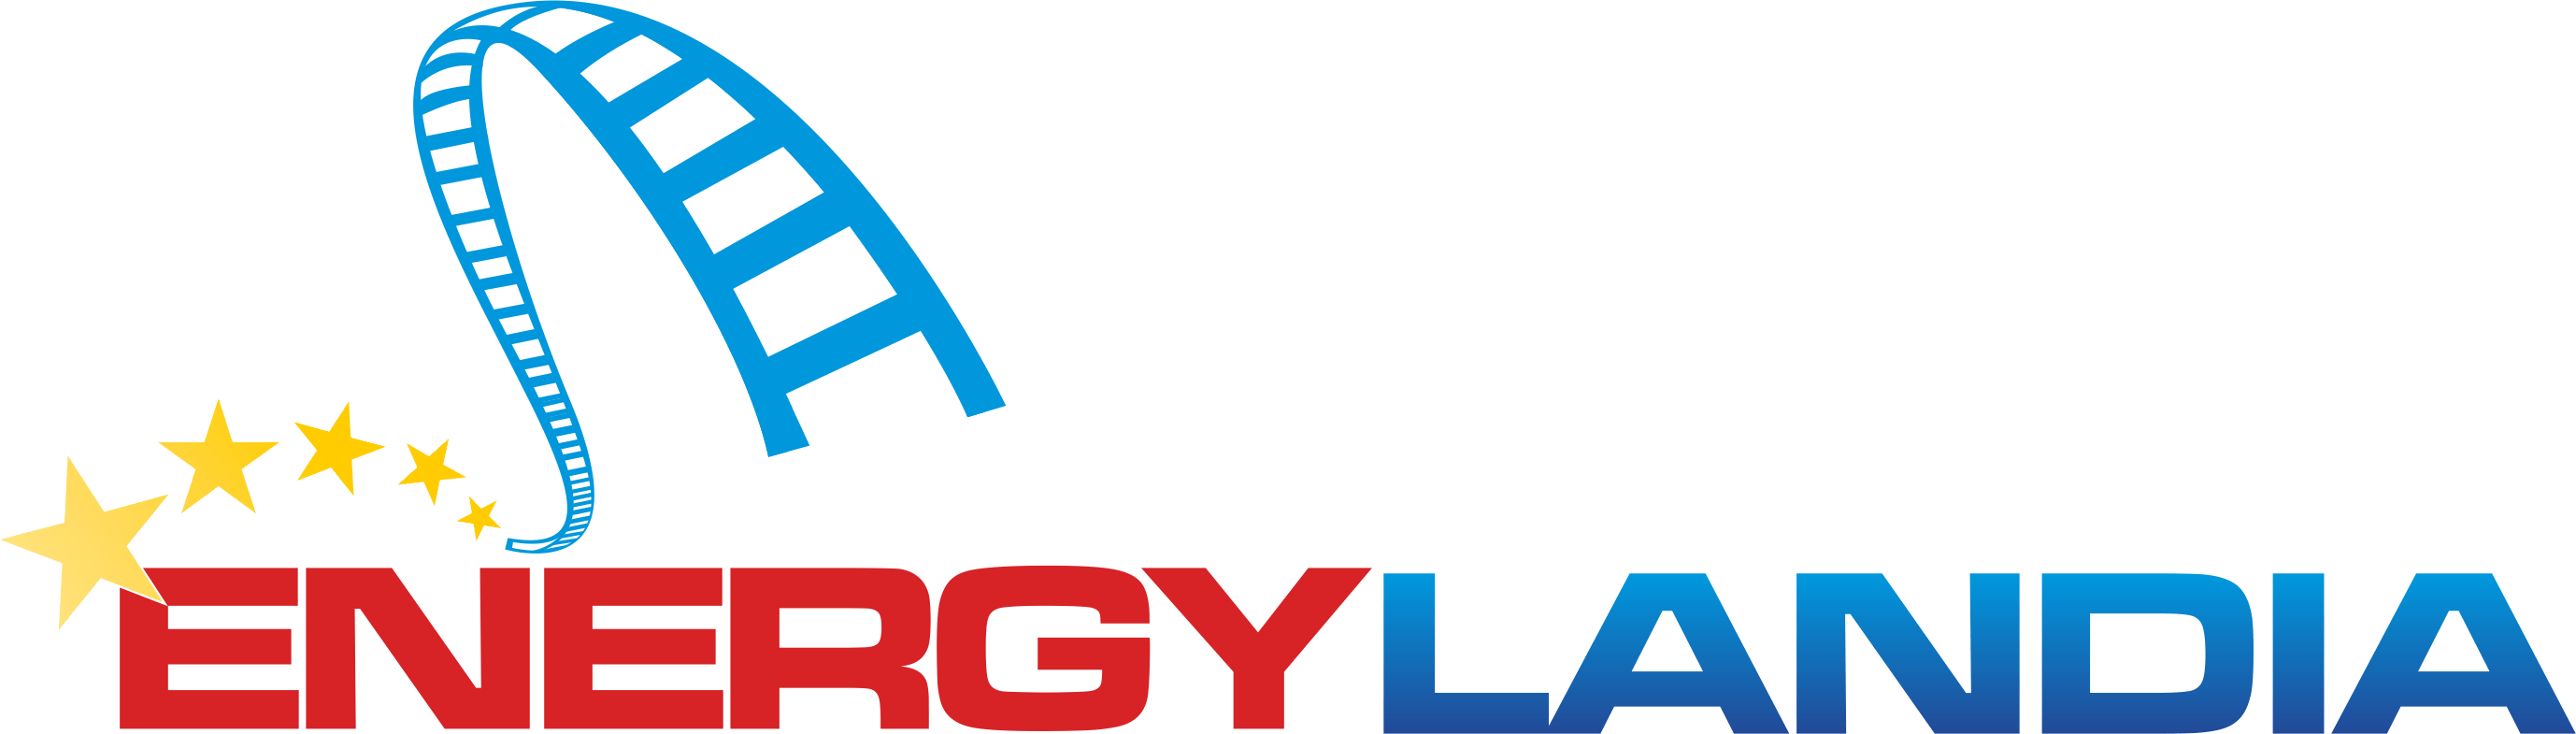 Znalezione obrazy dla zapytania energylandia logo